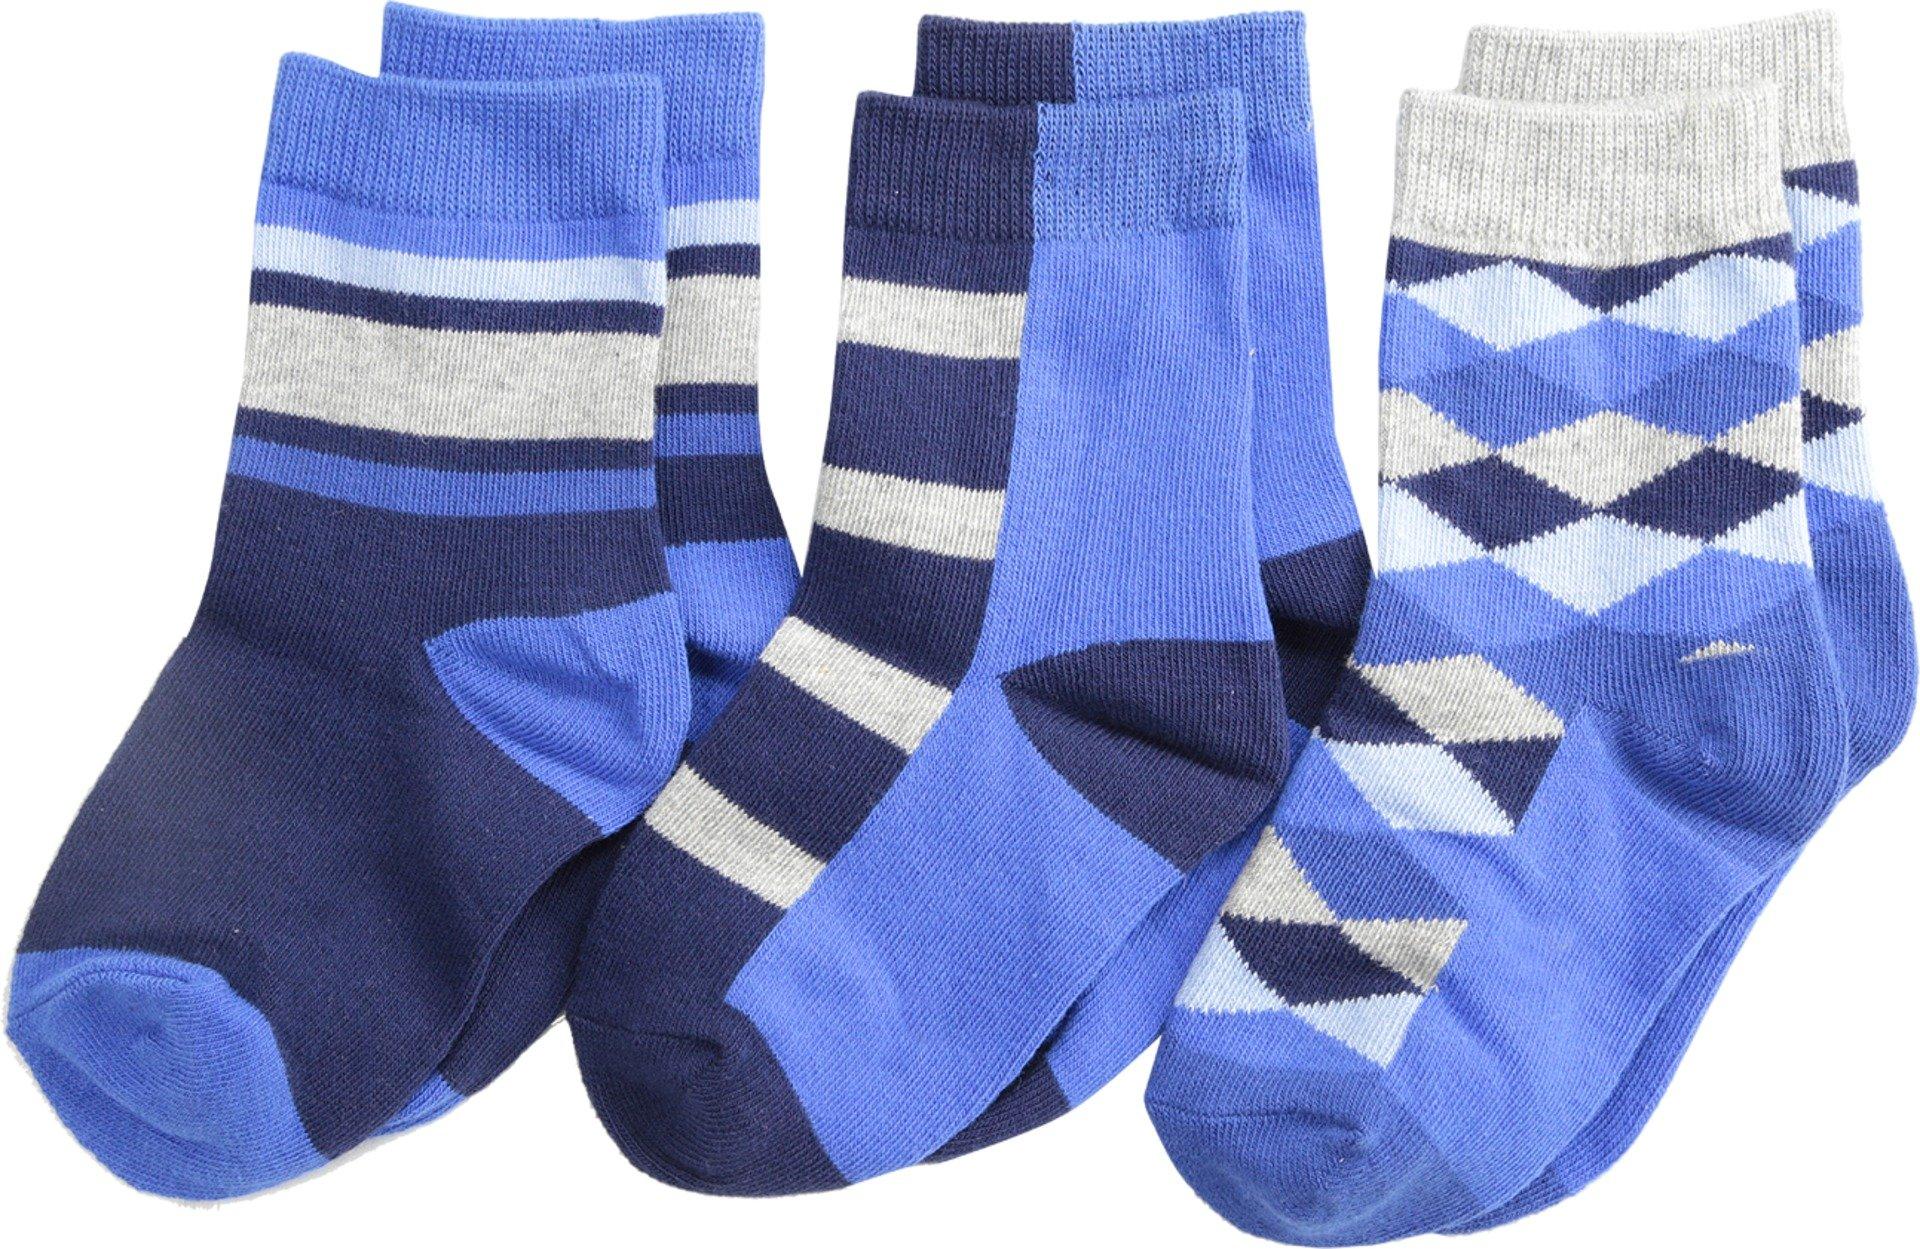 Jefferies Socks Baby Boy's Argyle Stripe Crew Socks 3 Pack (Toddler/Little Kid/Big Kid) Navy Sock